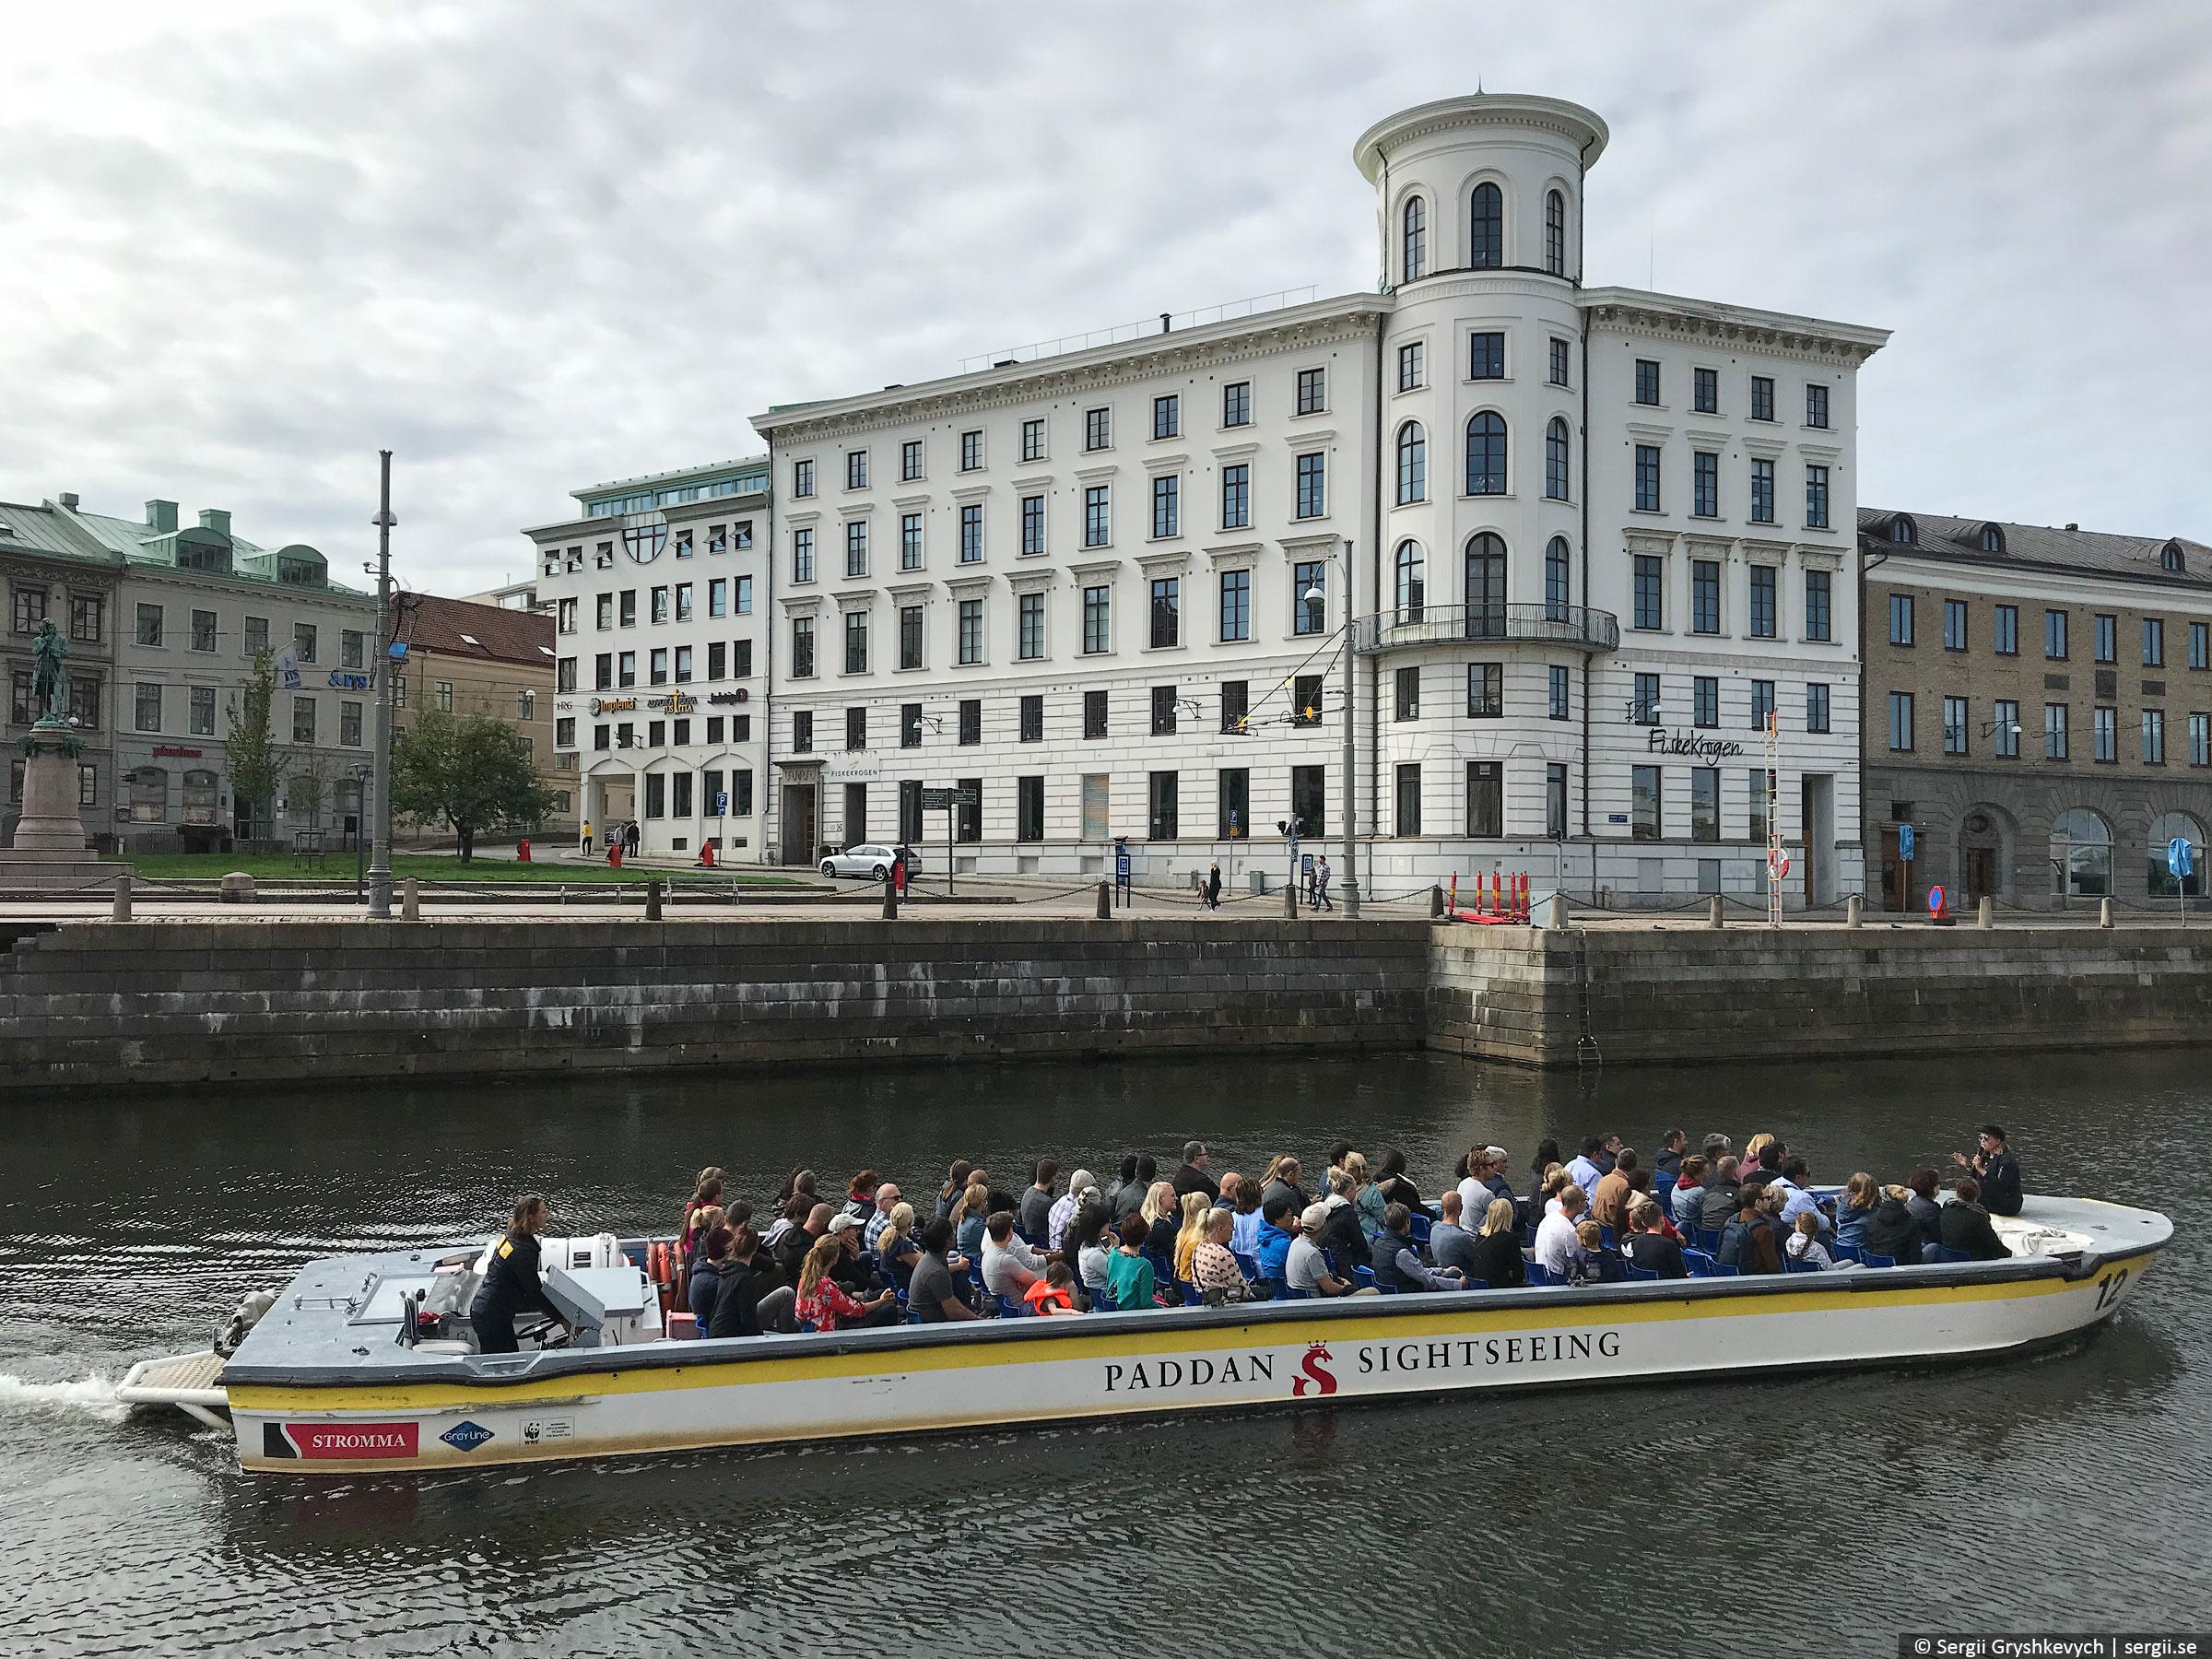 göteborg-ghotenburg-sweden-2018-25